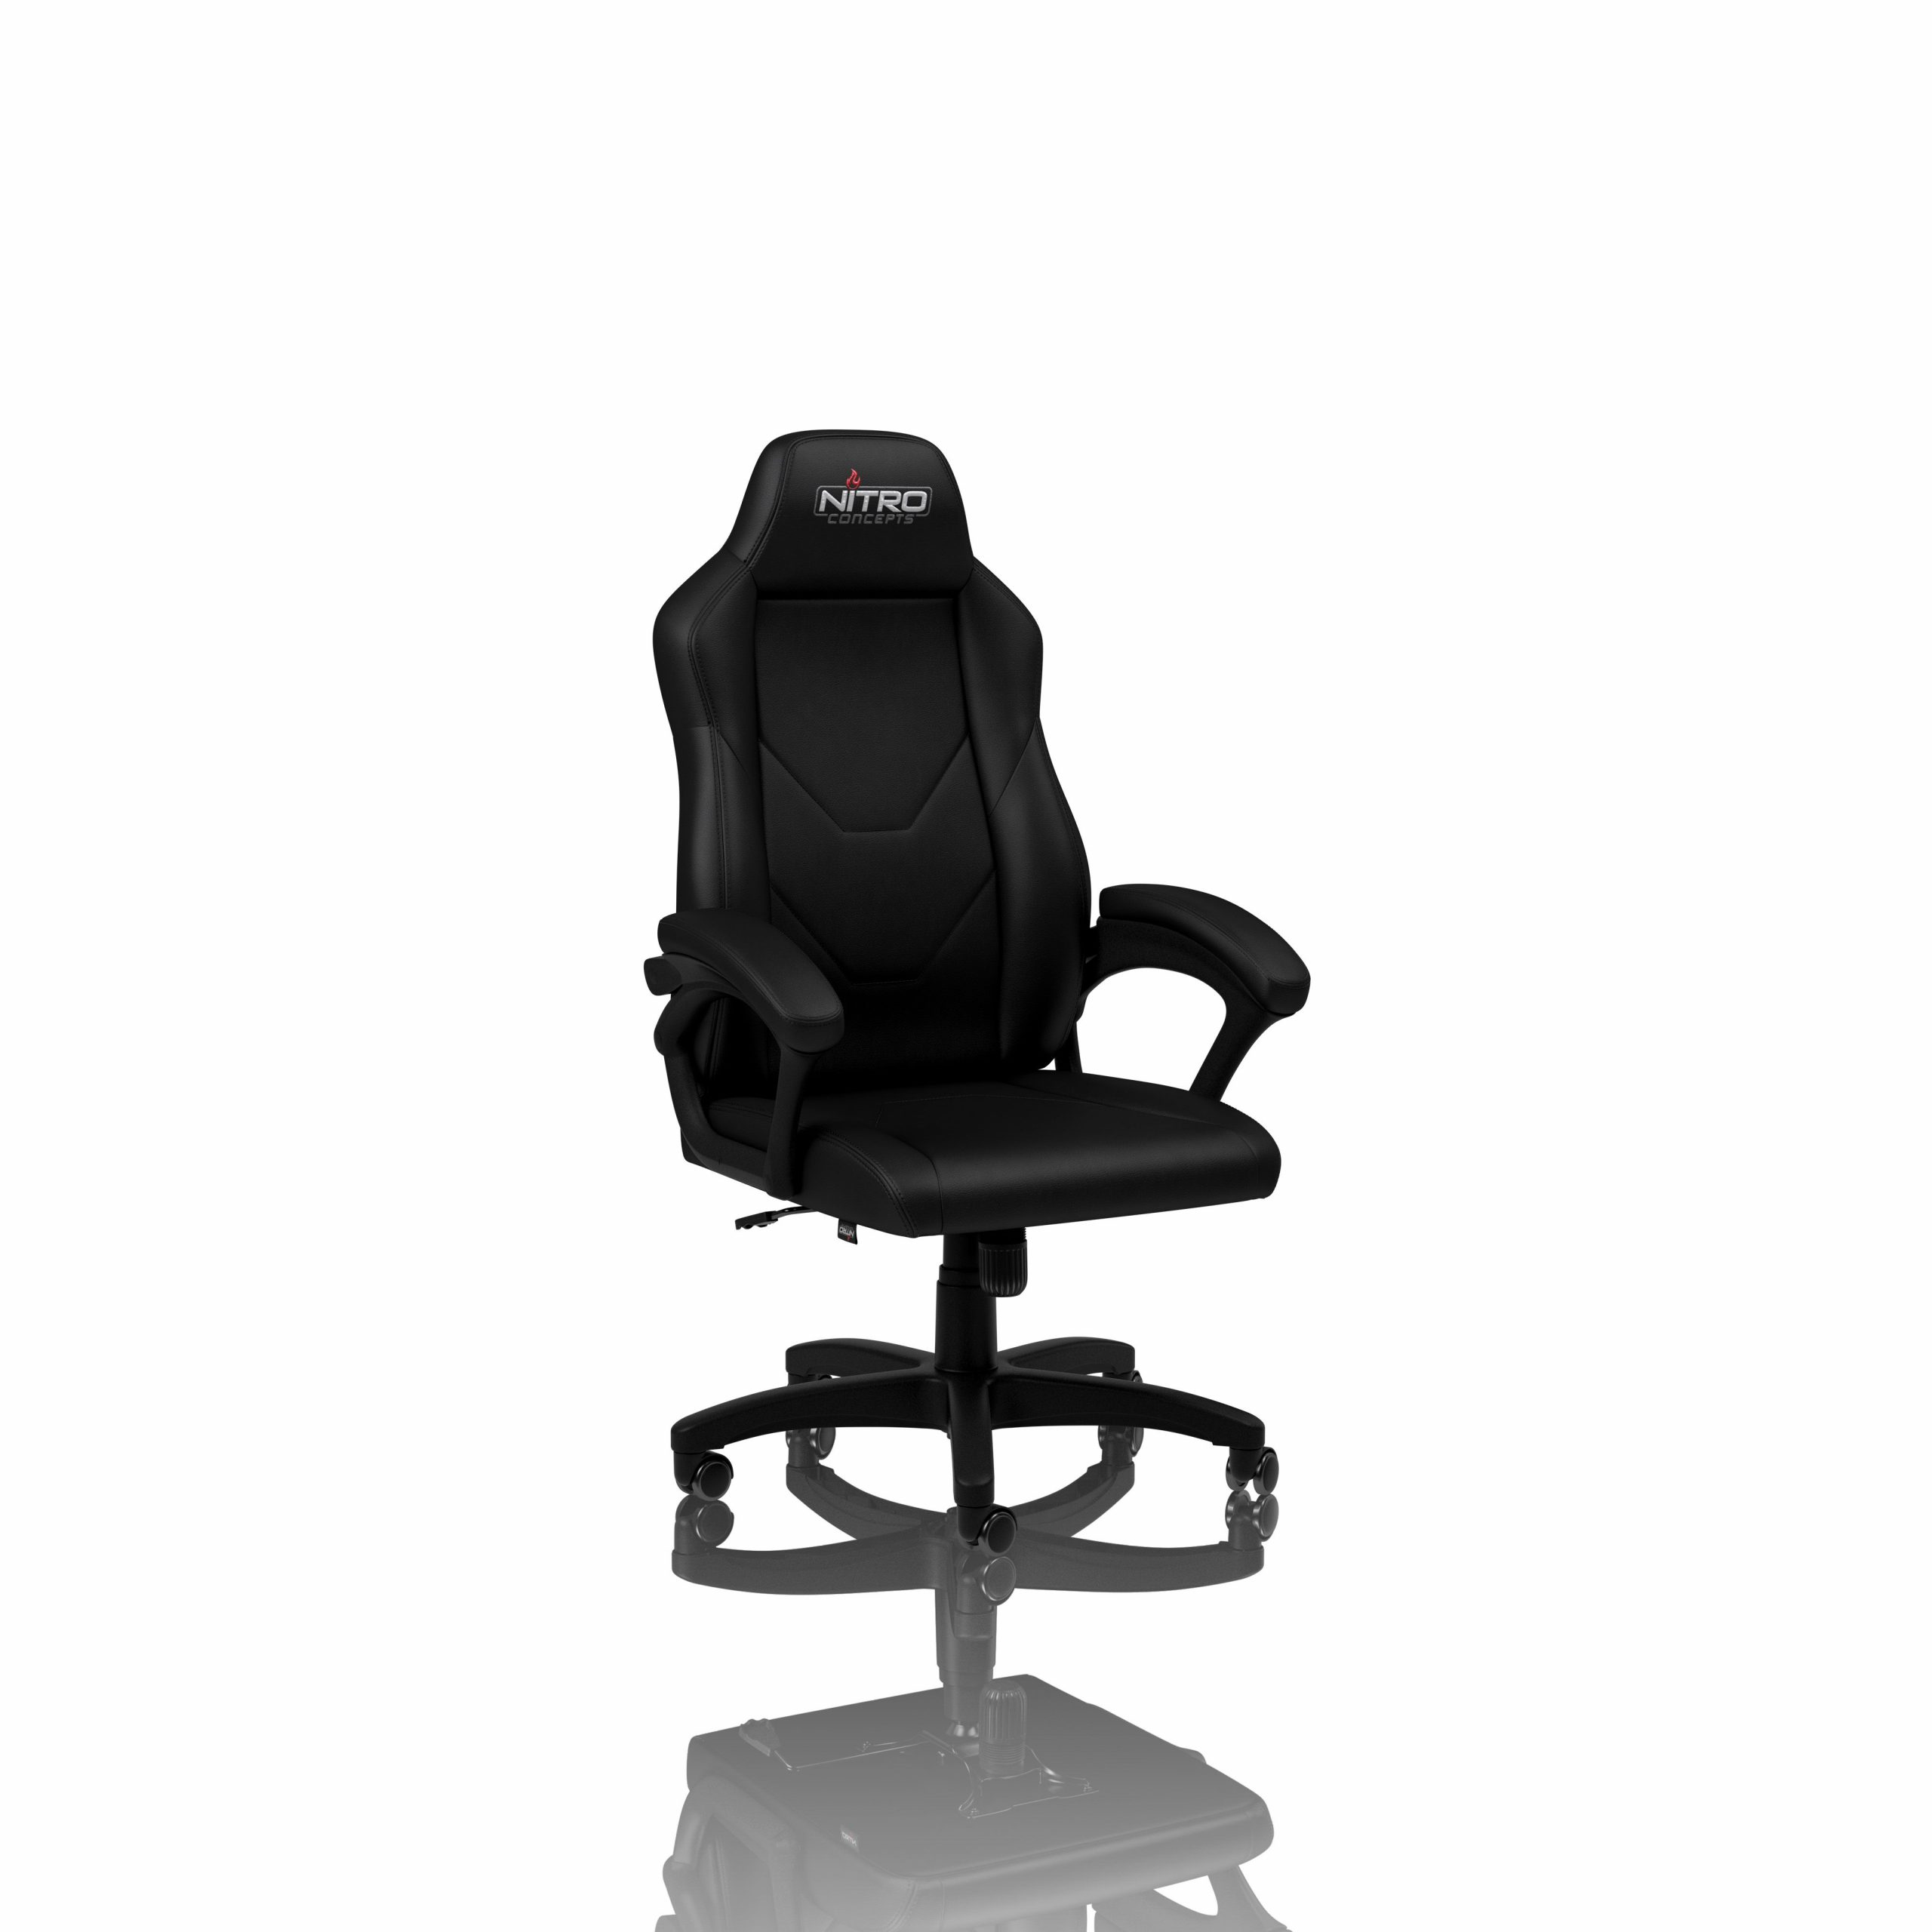 Nitro Concepts C100 Gaming Chair - black - CASEKING 2.35.63.02.001